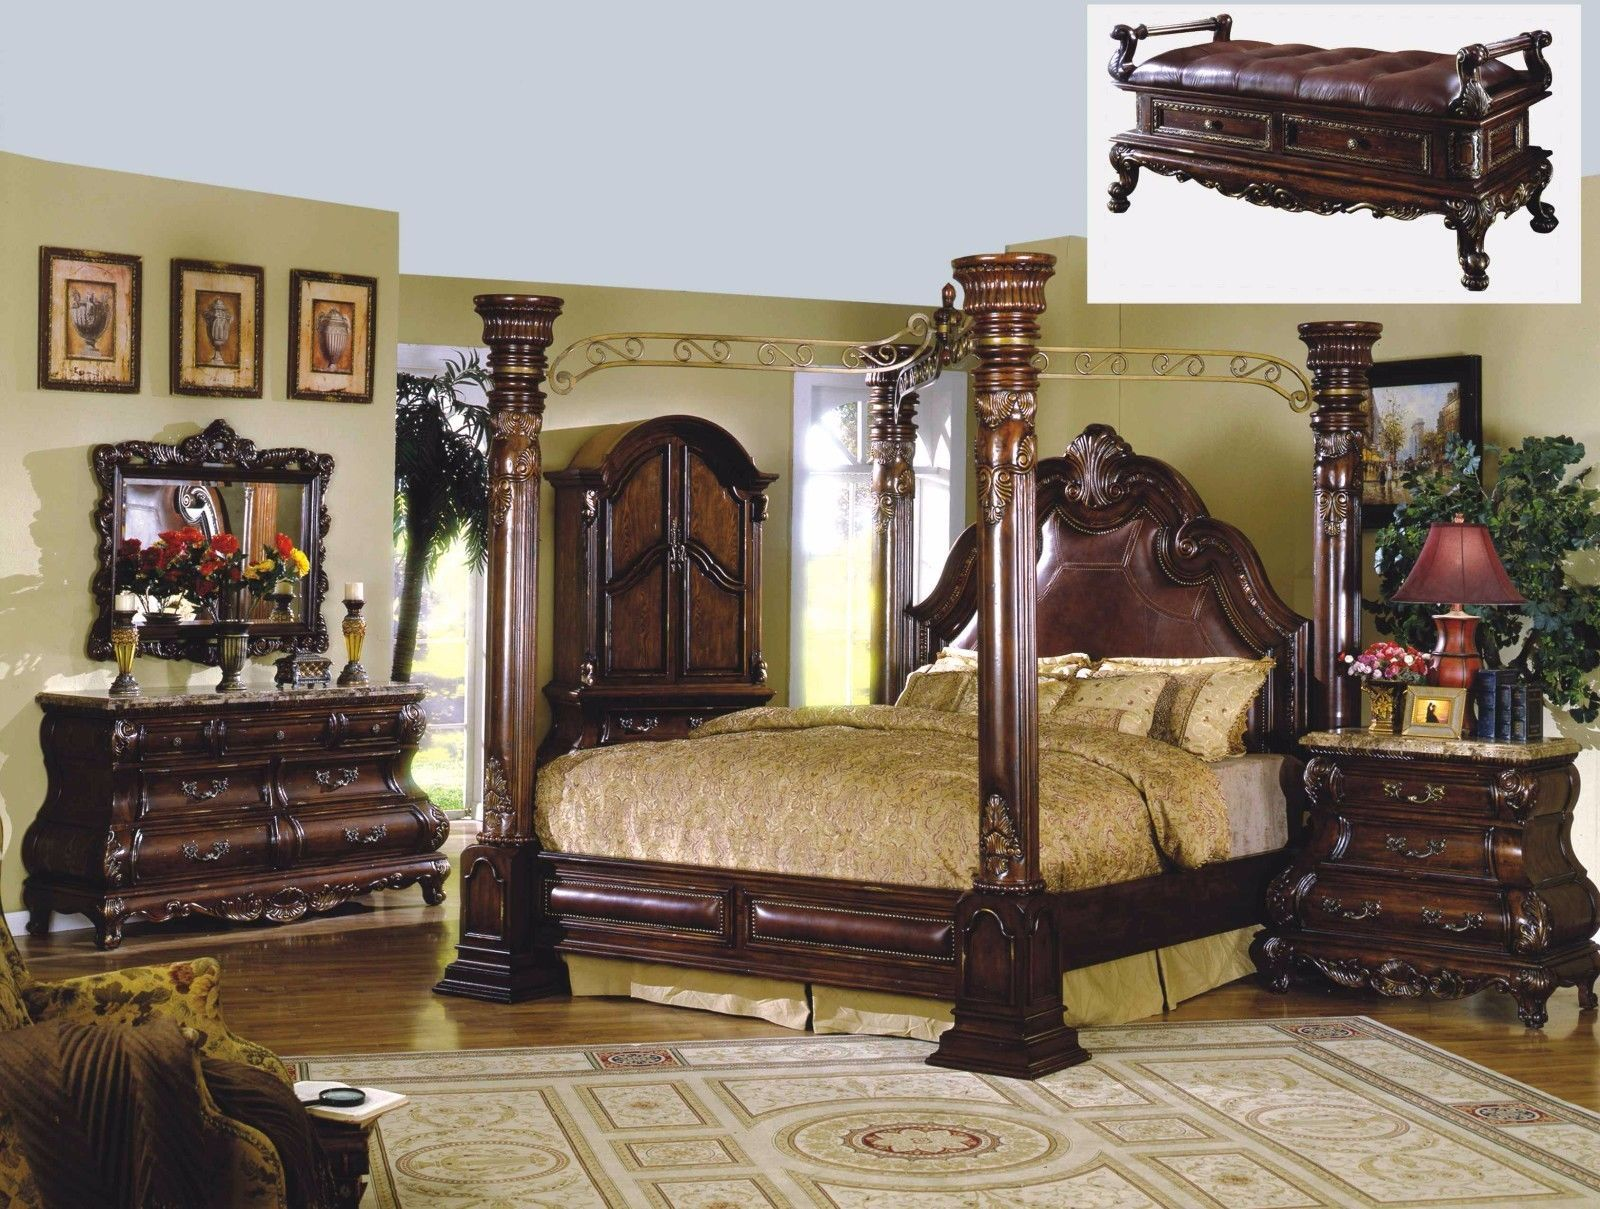 Mcferran RB9088 Monaco Leather California King Size Bedroom set 3.pc Traditional